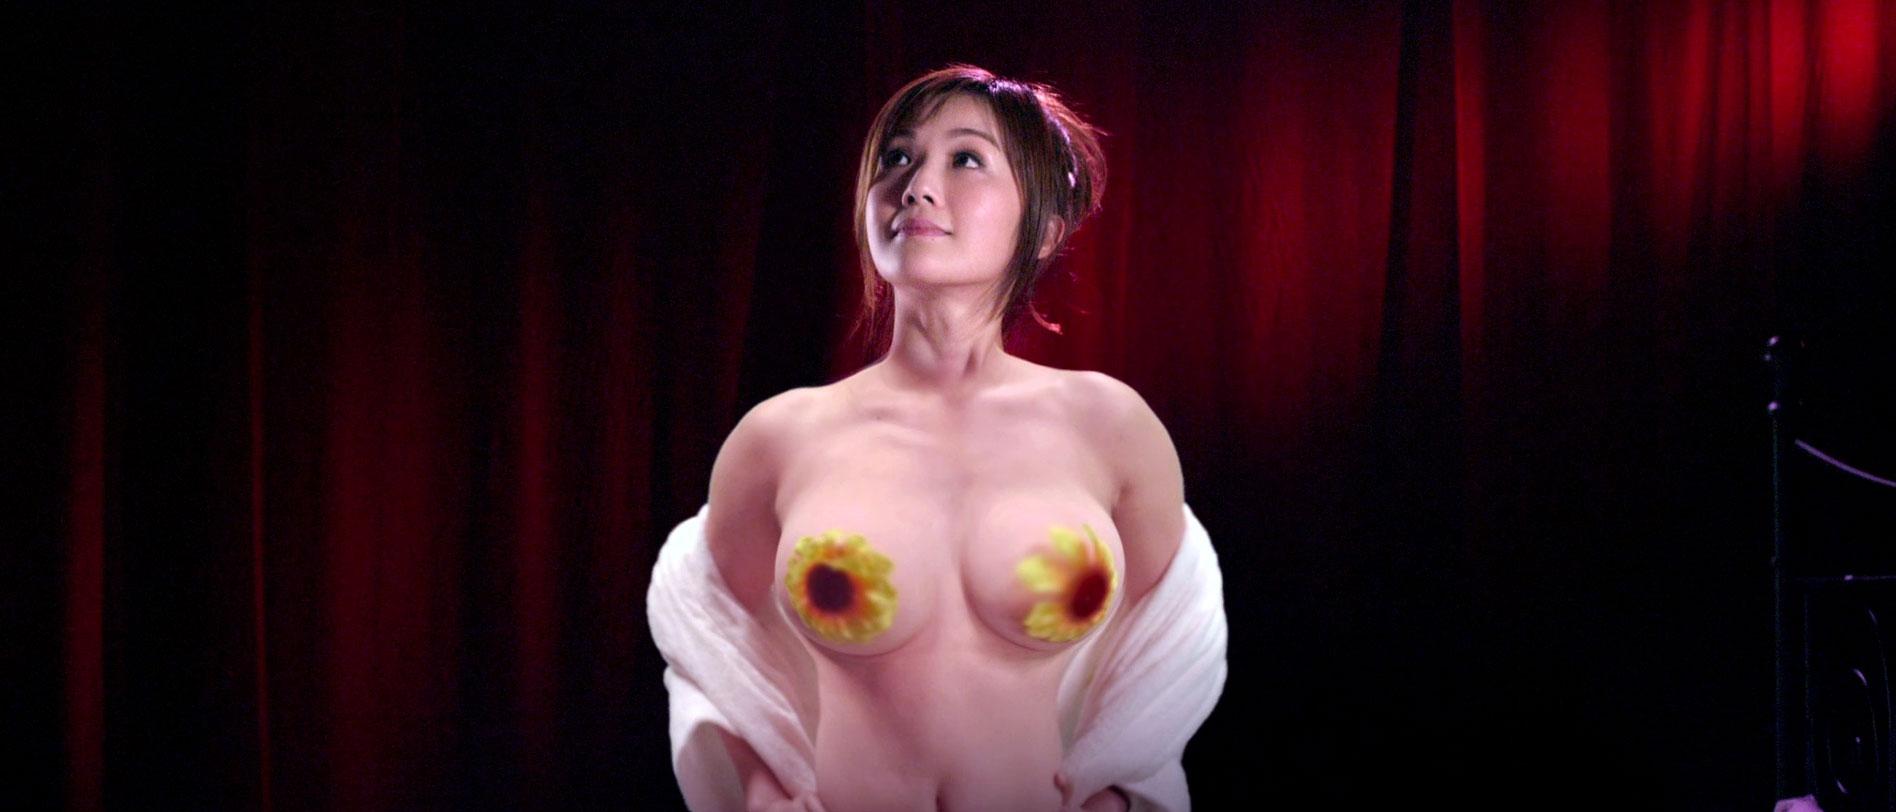 Charlene choi on imageing the lady improper